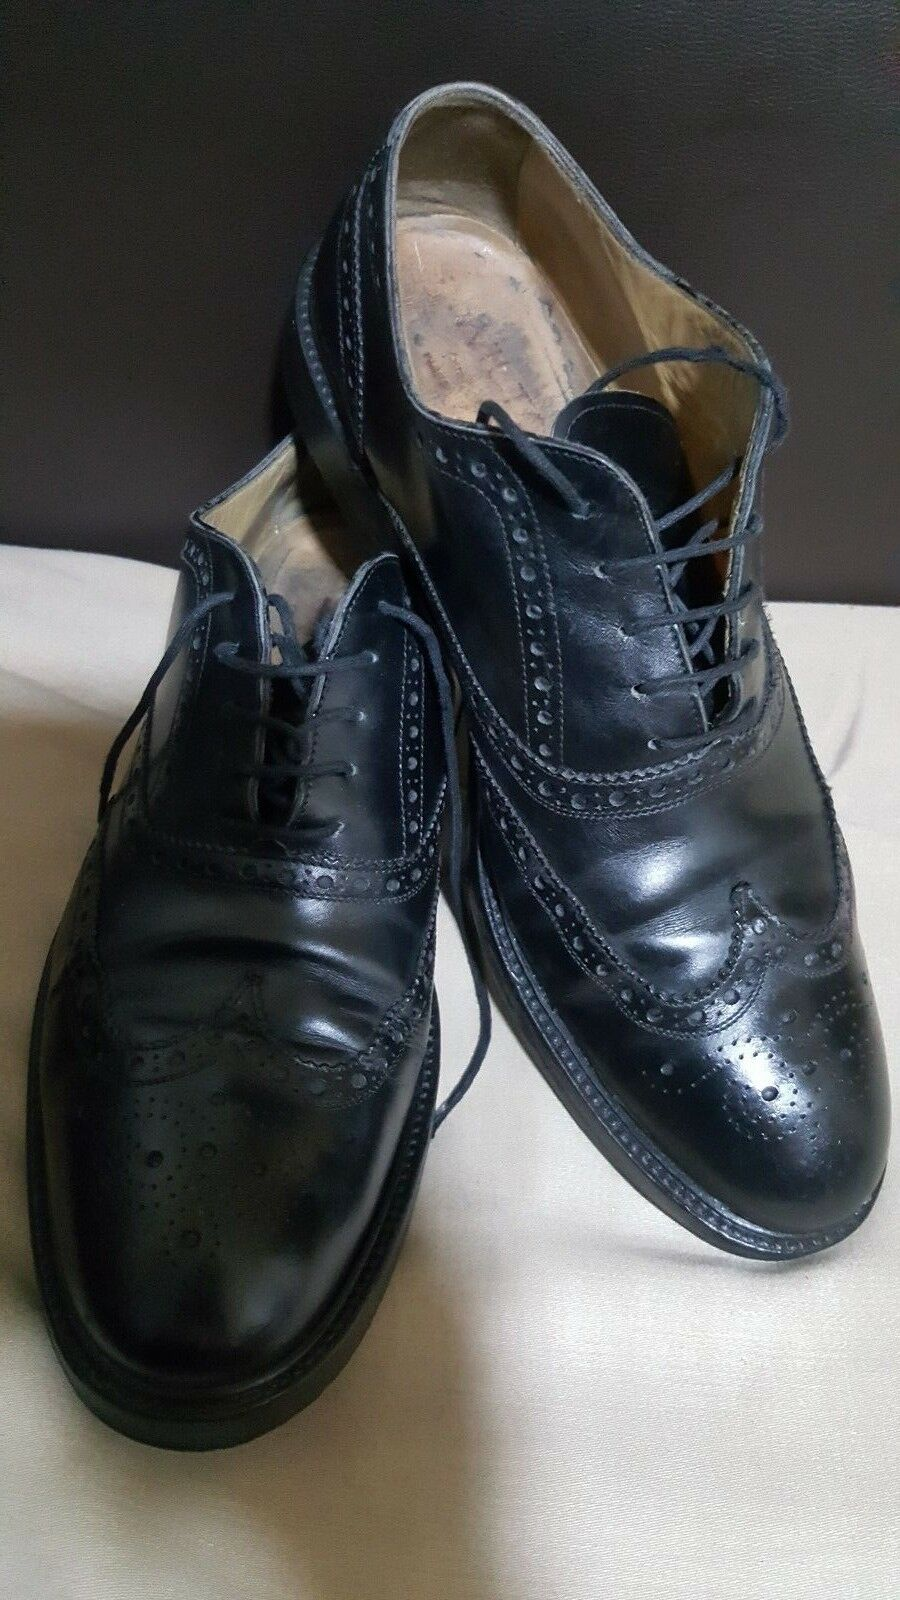 J. WILTON Italian Classic lace-up, Black Leather Men's shoes -size UK 9  EU 44-